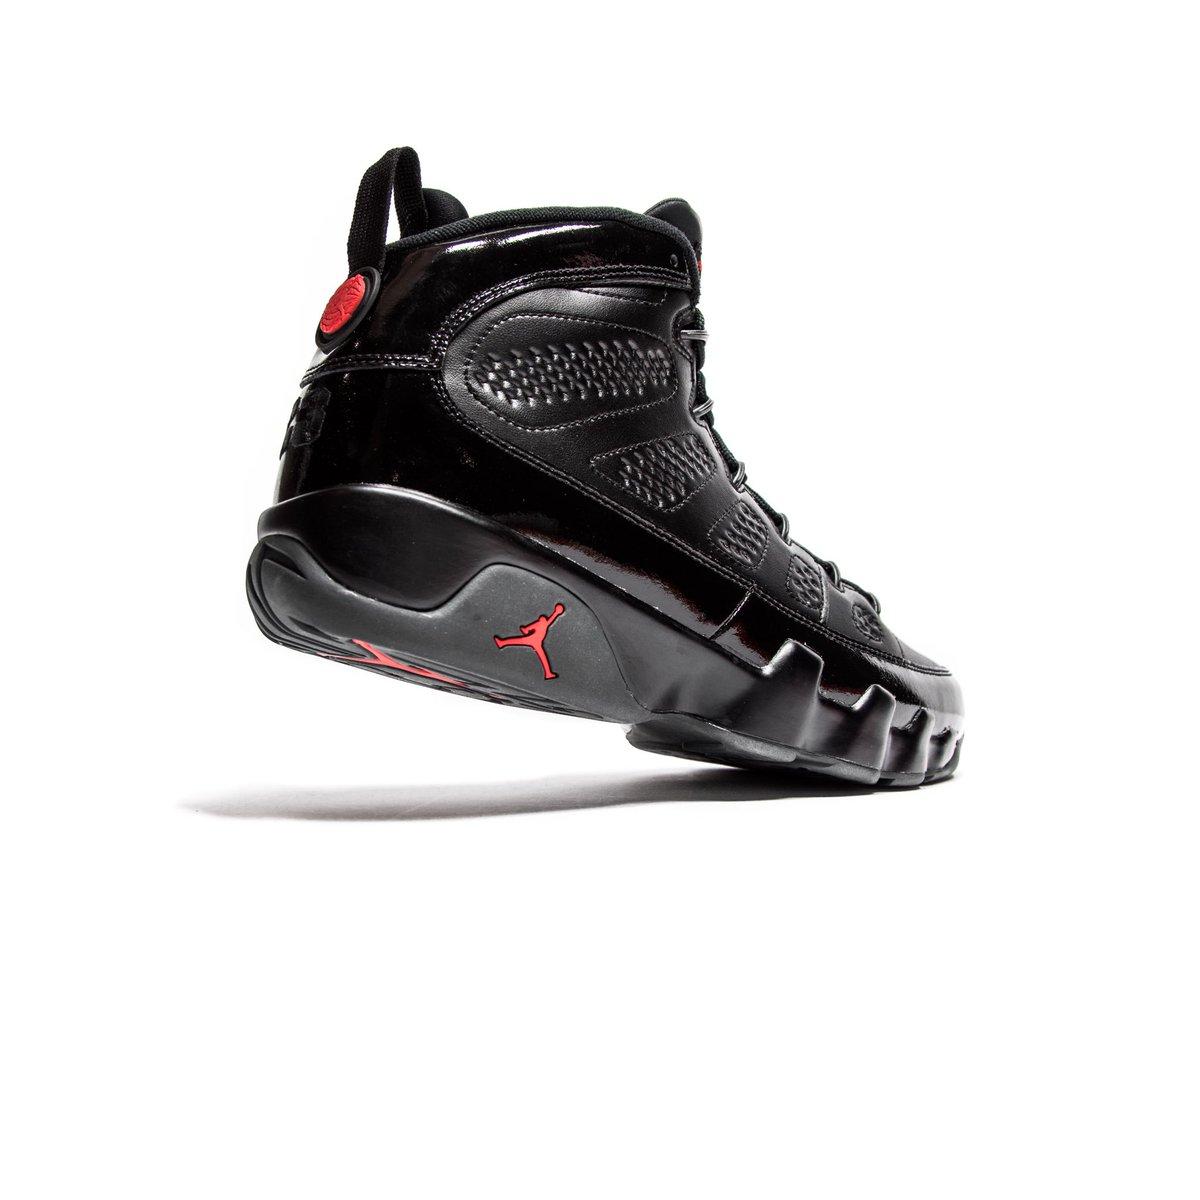 1b24b3b36a634d The Air Jordan Retro 9  Bred  drops Tomorrow at Jimmy jazz pic.twitter.com gGg3IBGf0Y